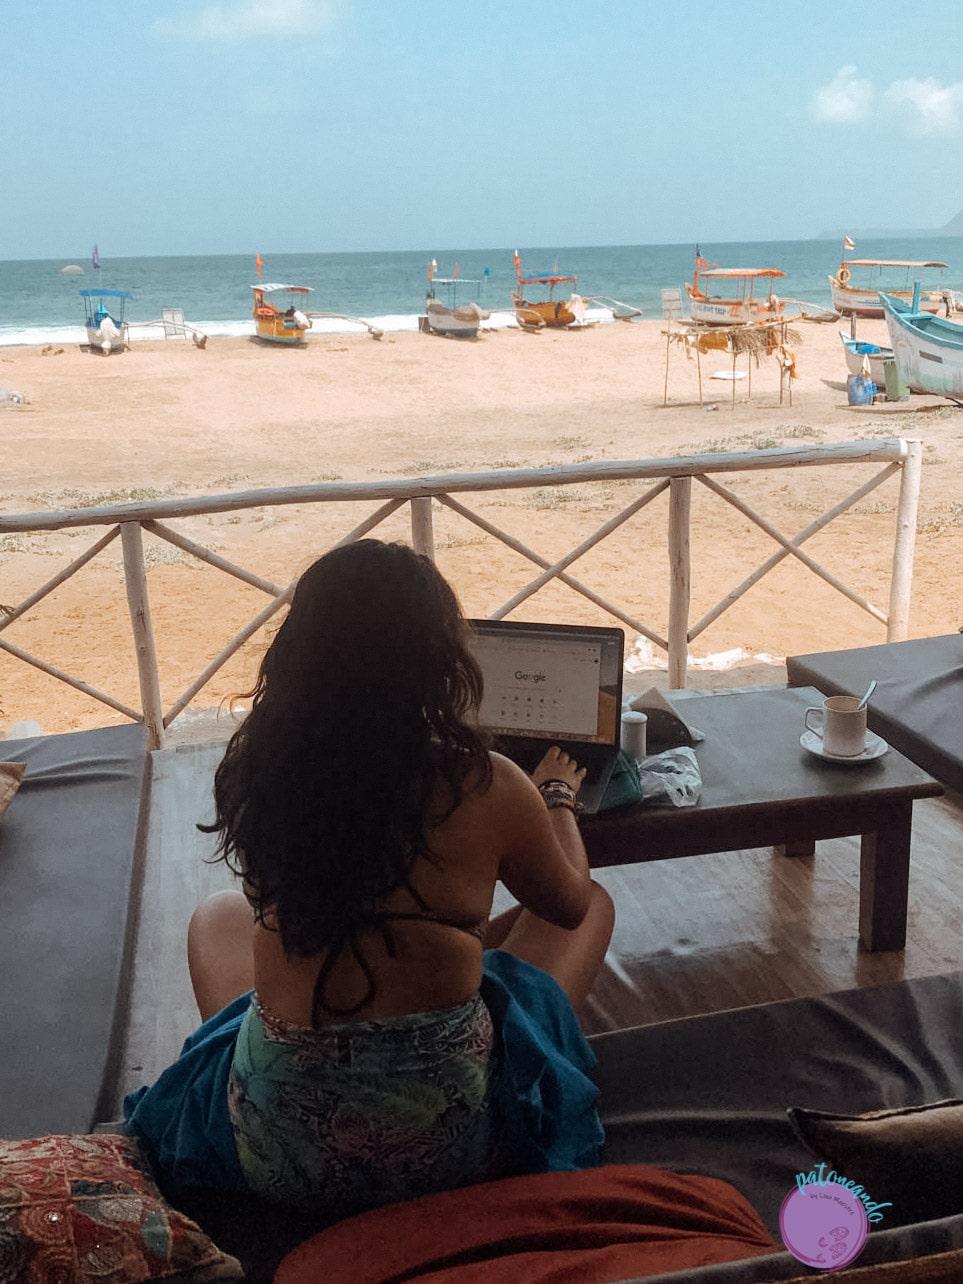 Nómada digital trabajando frente al mar -Lina Maestre - Patoneando